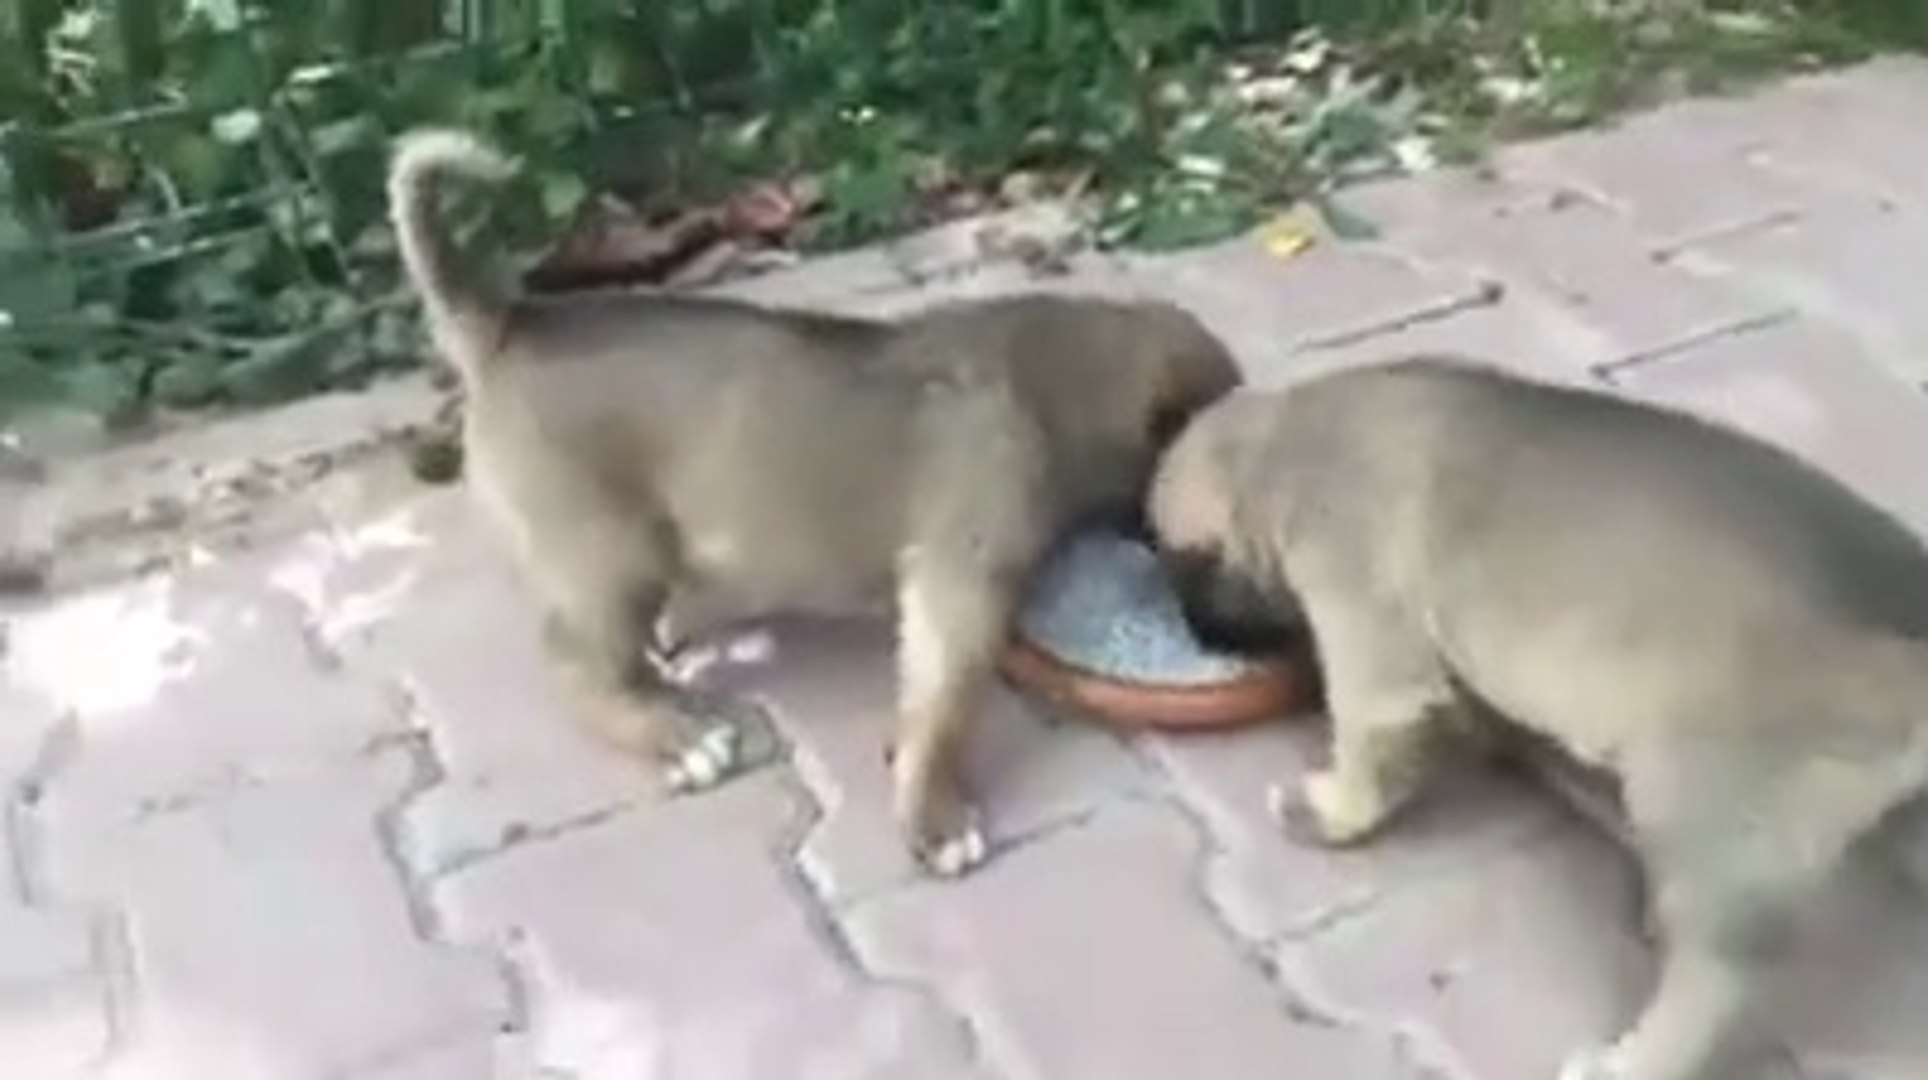 ANADOLU ASLAN YAVRULARI COK ACIKMIS - SHEPHERD DOG PUPPiES and DOG FOOD